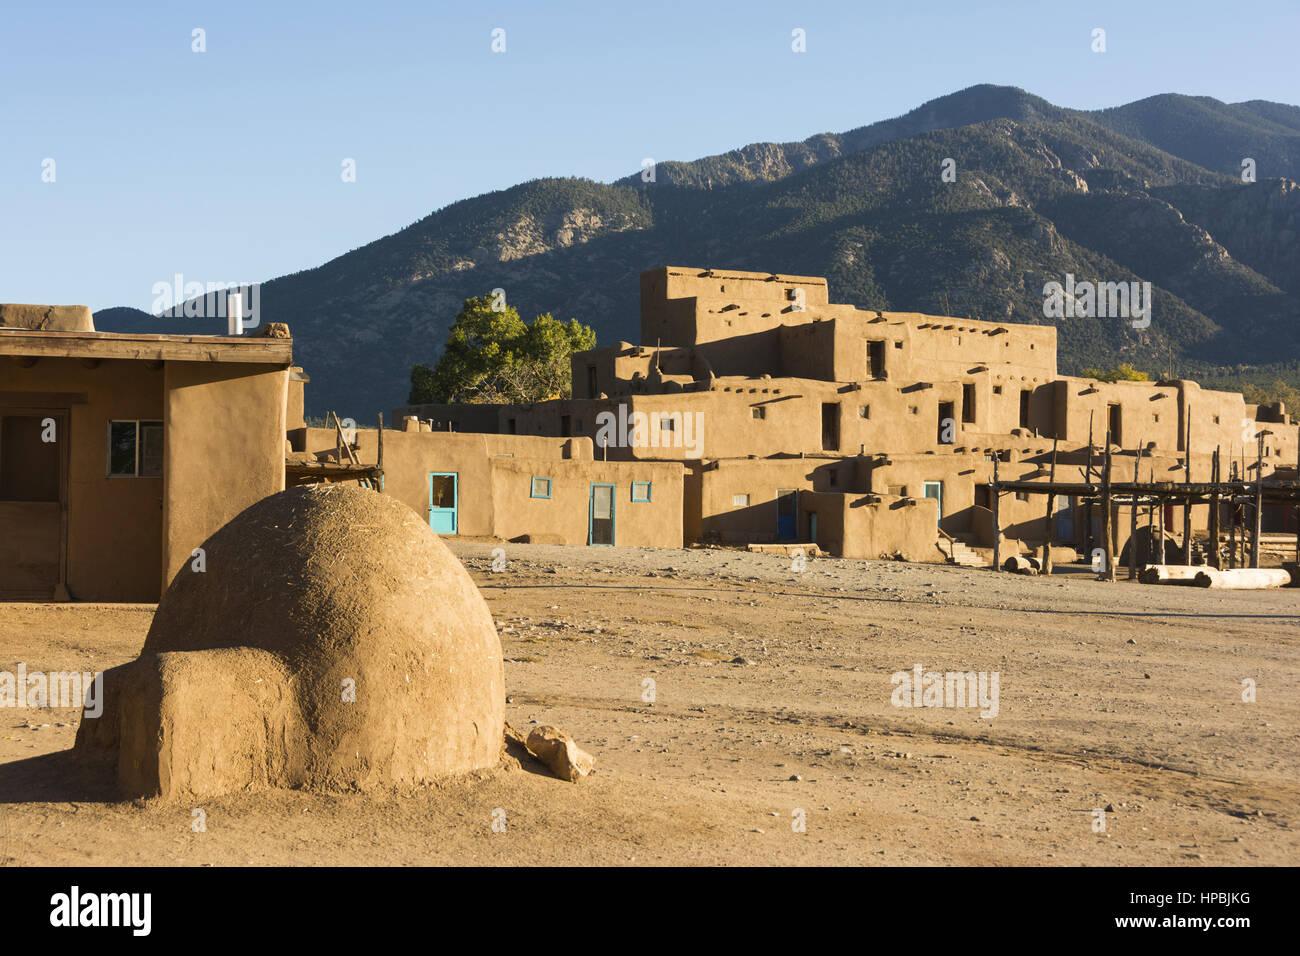 New Mexico, Taos, Taos Pueblo - Stock Image